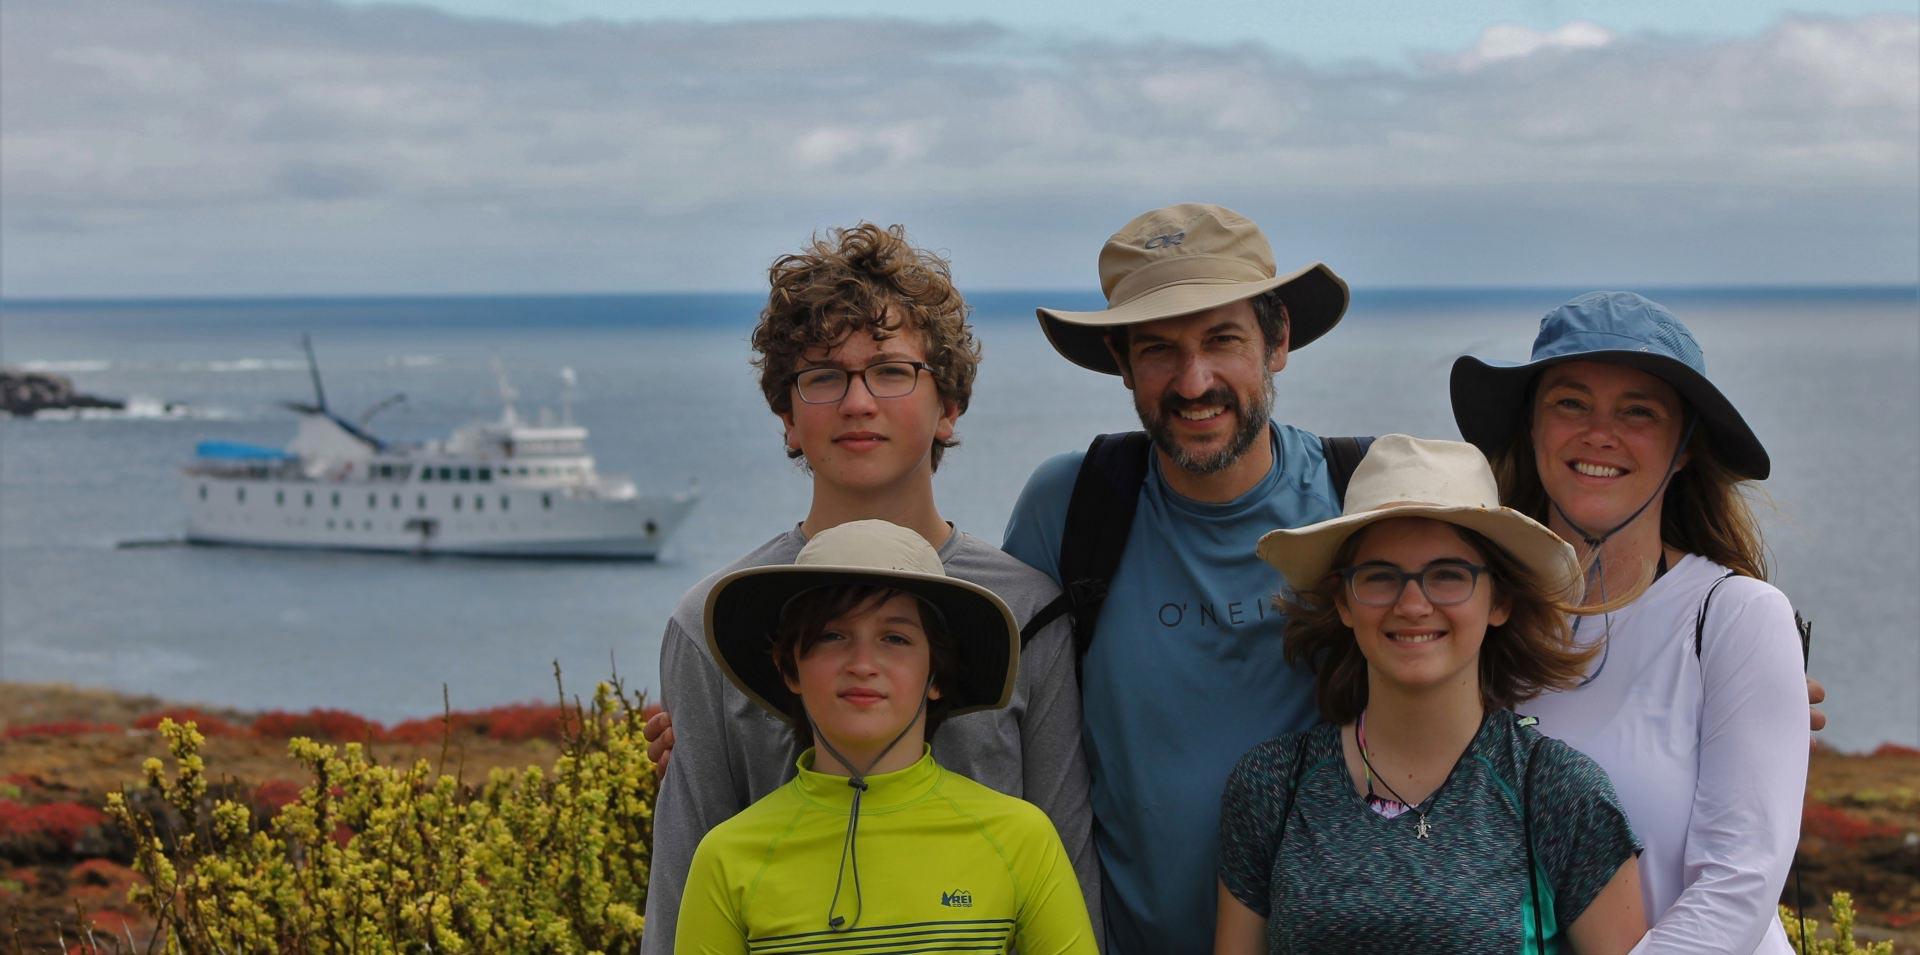 Family enjoying their visit to the Galapagos Islands